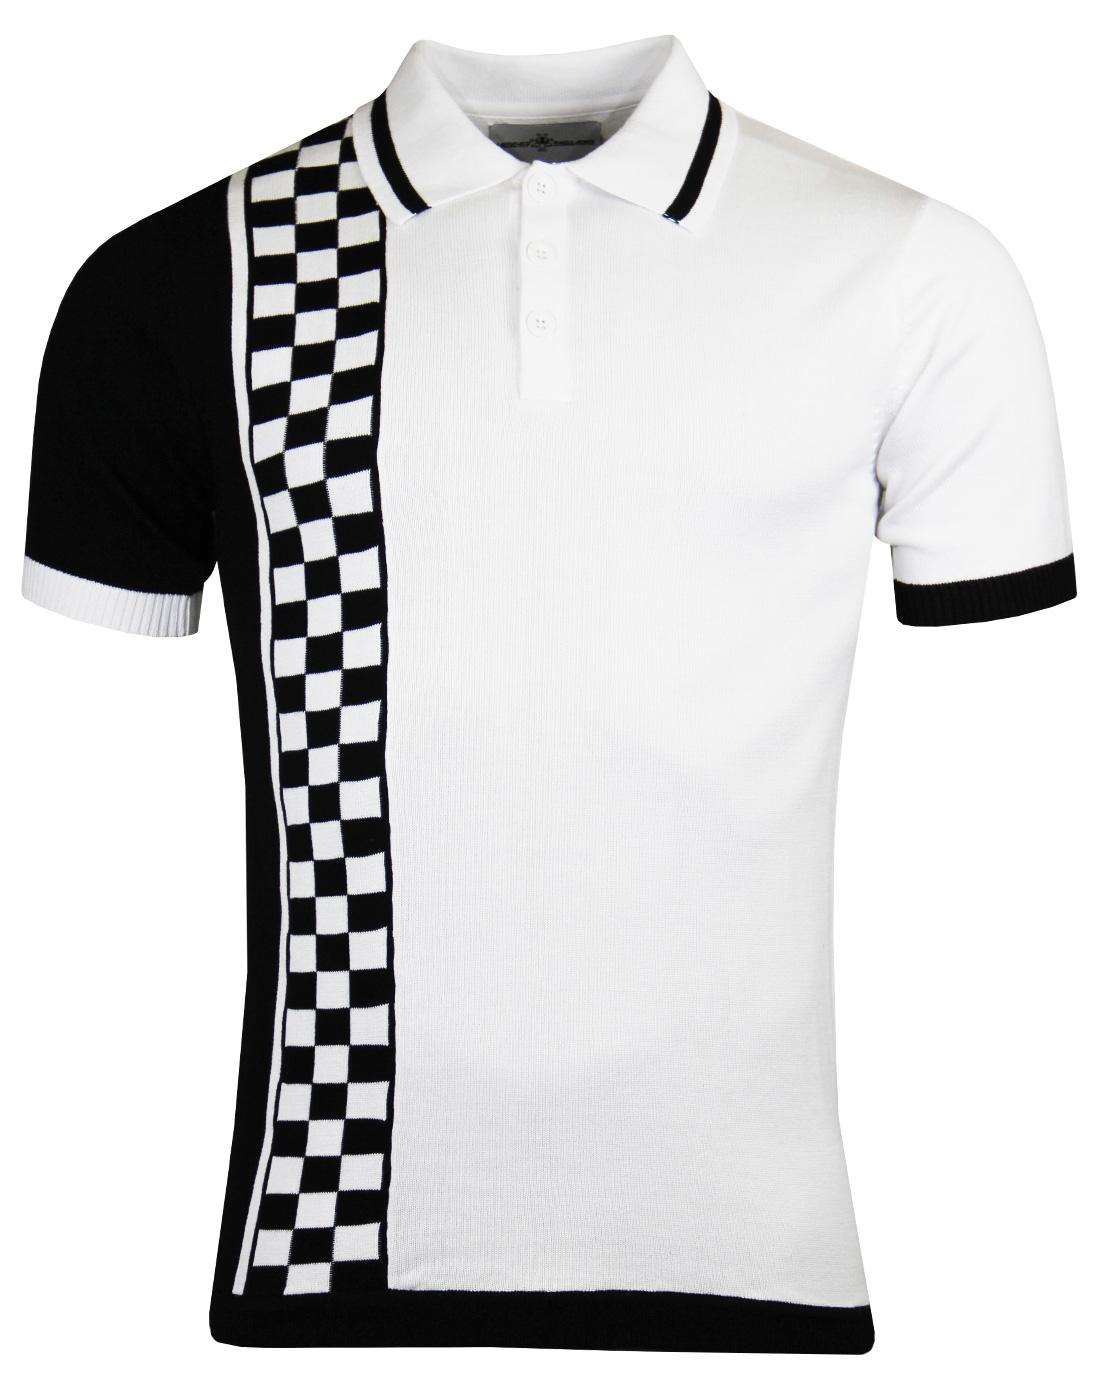 Madcap England Maytal Mens Retro Mod 70s Ska Checkerboard